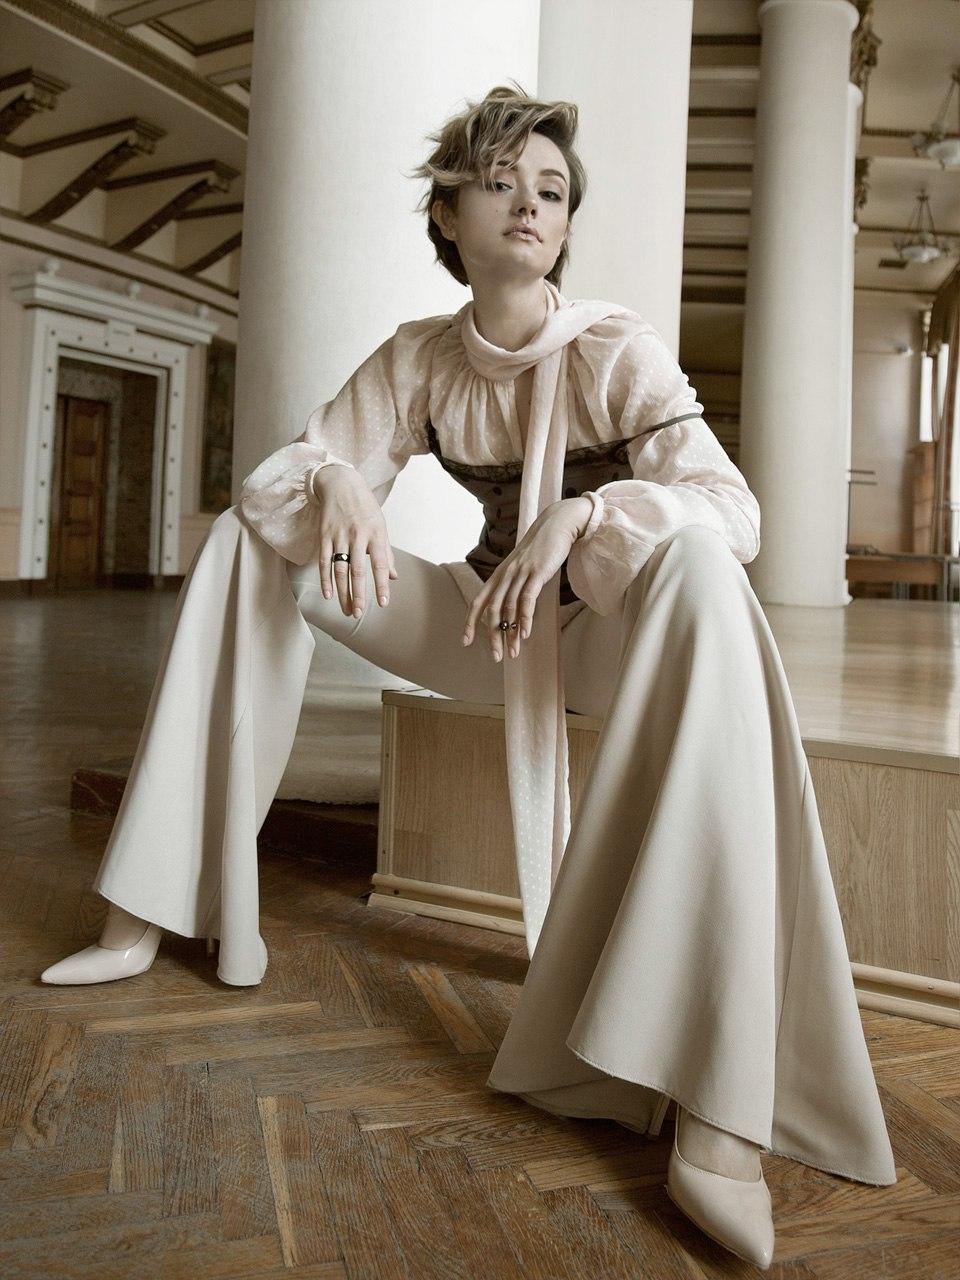 Photography Zhanna Zankova - fashion - fashionphotography | ello